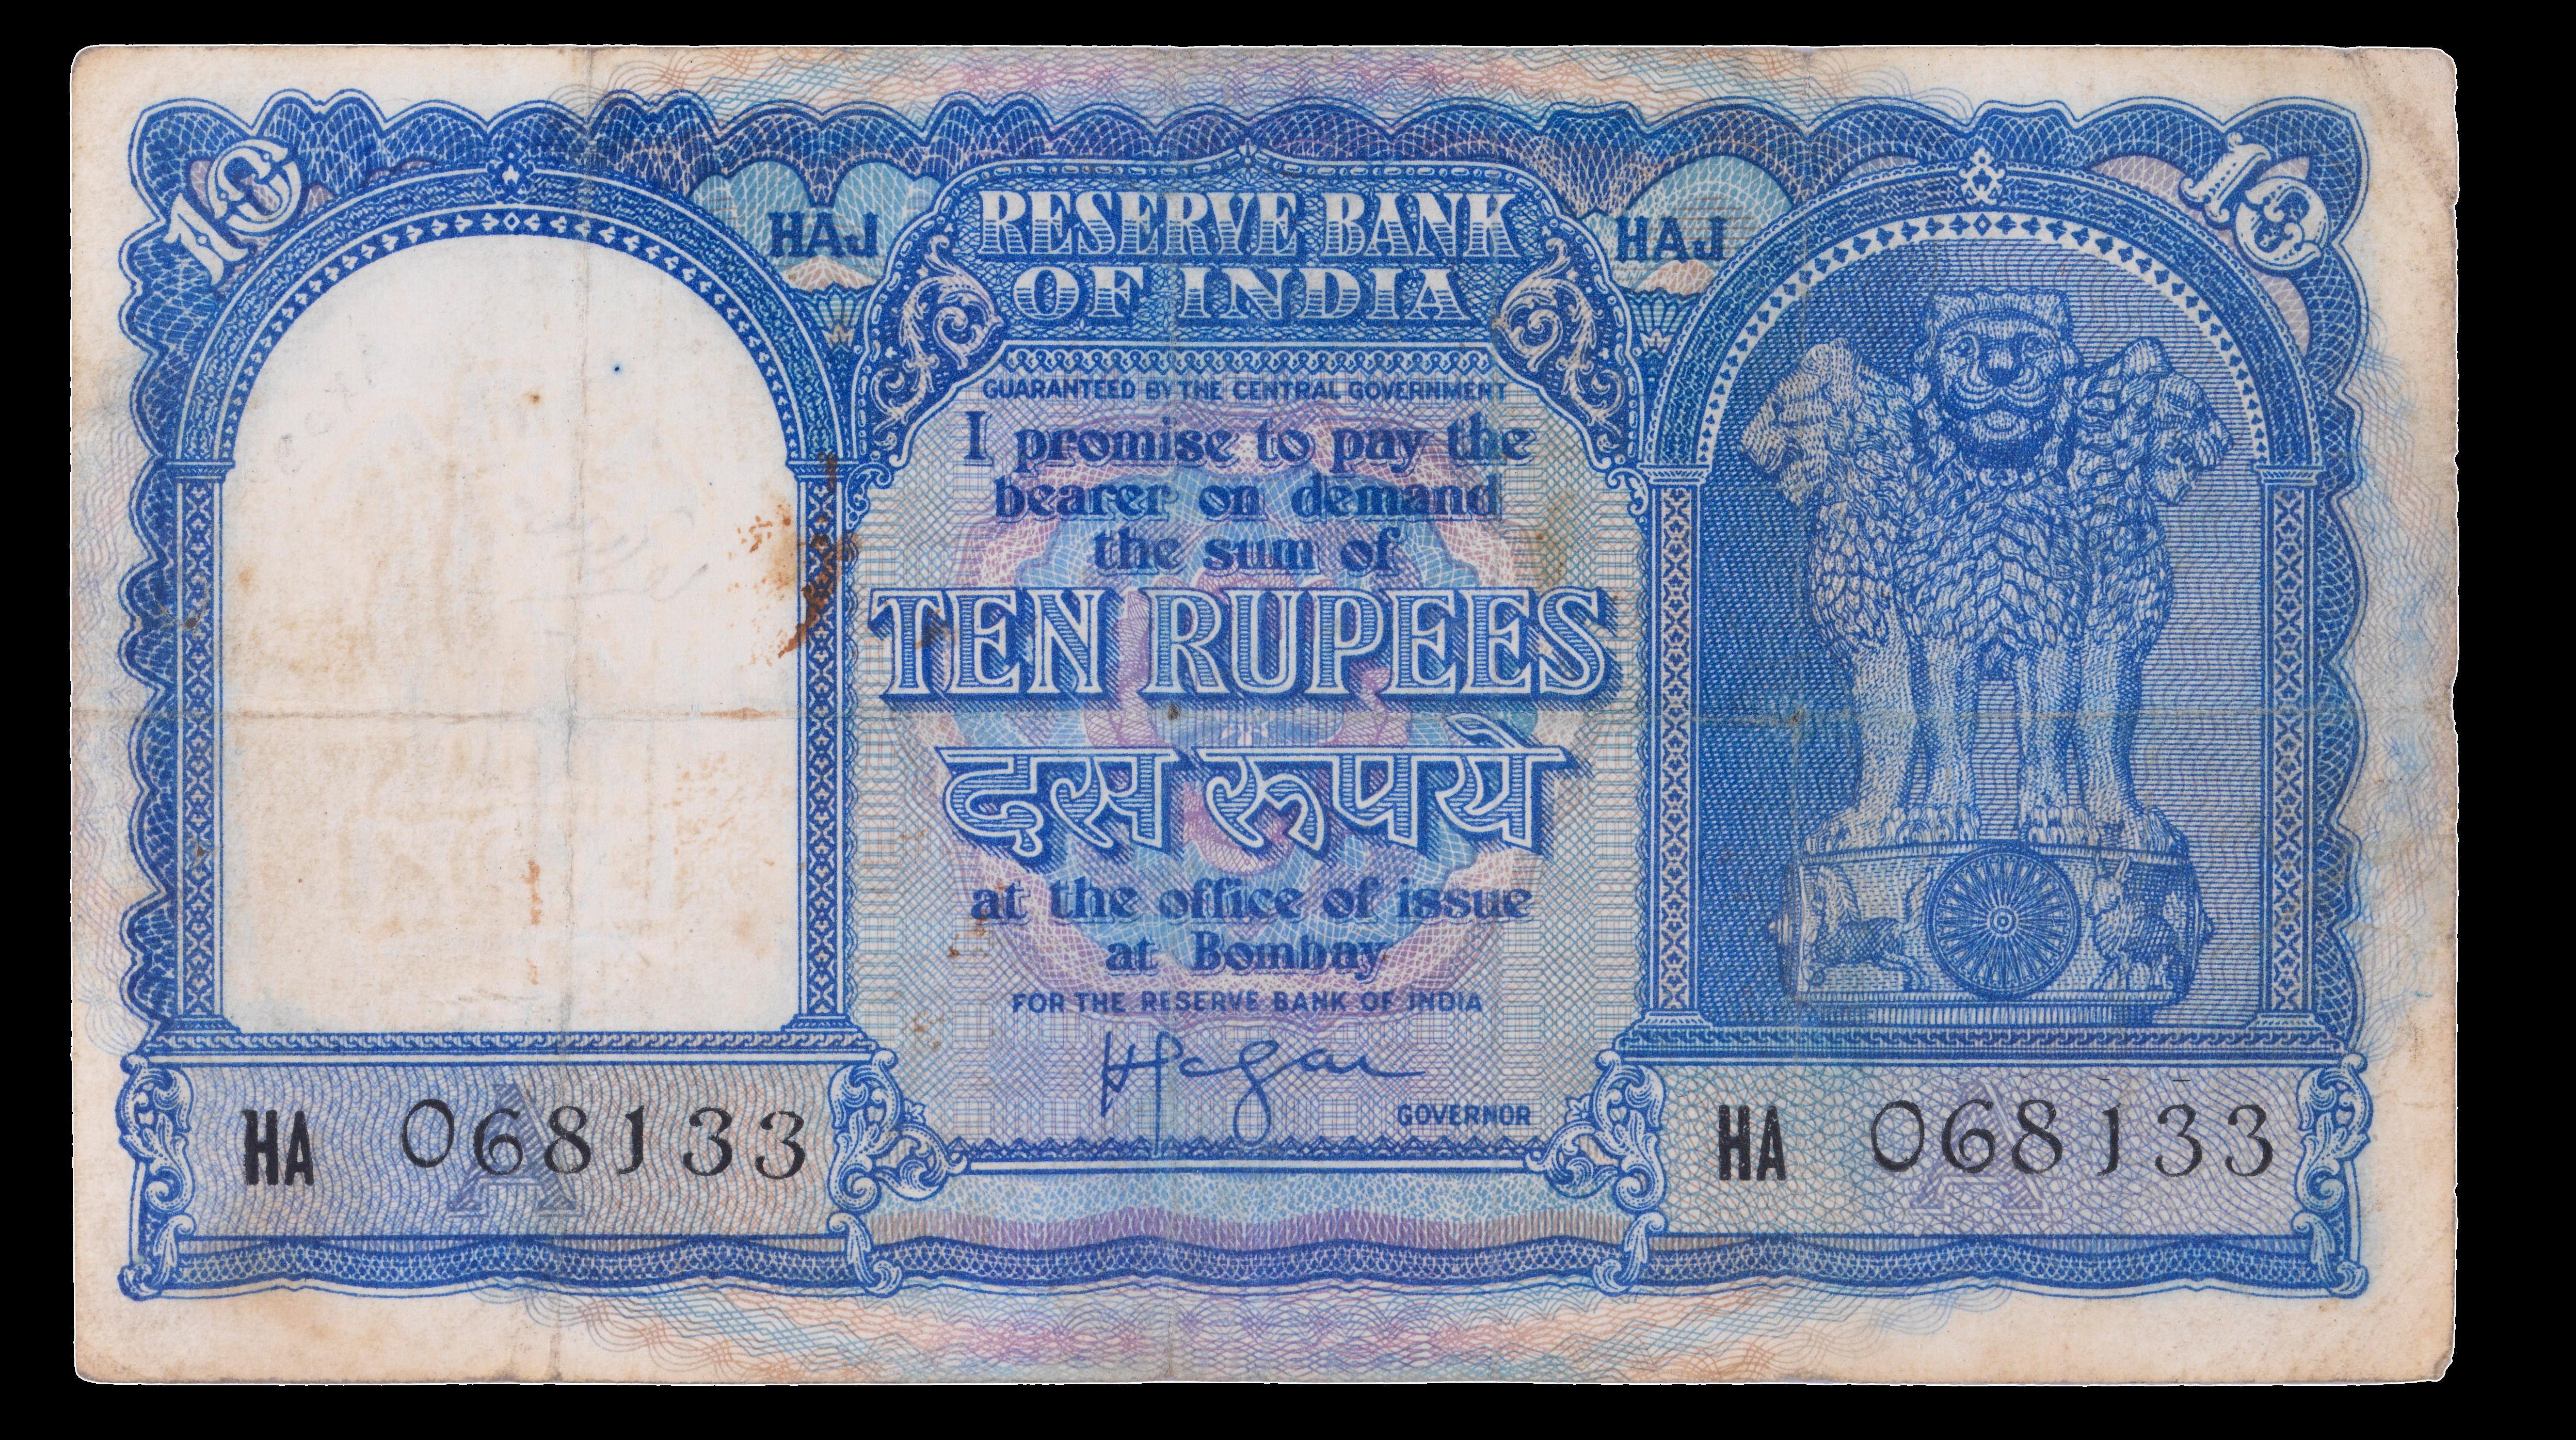 Reserve Bank of India – Haj Pilgrim issue, 10 rupees